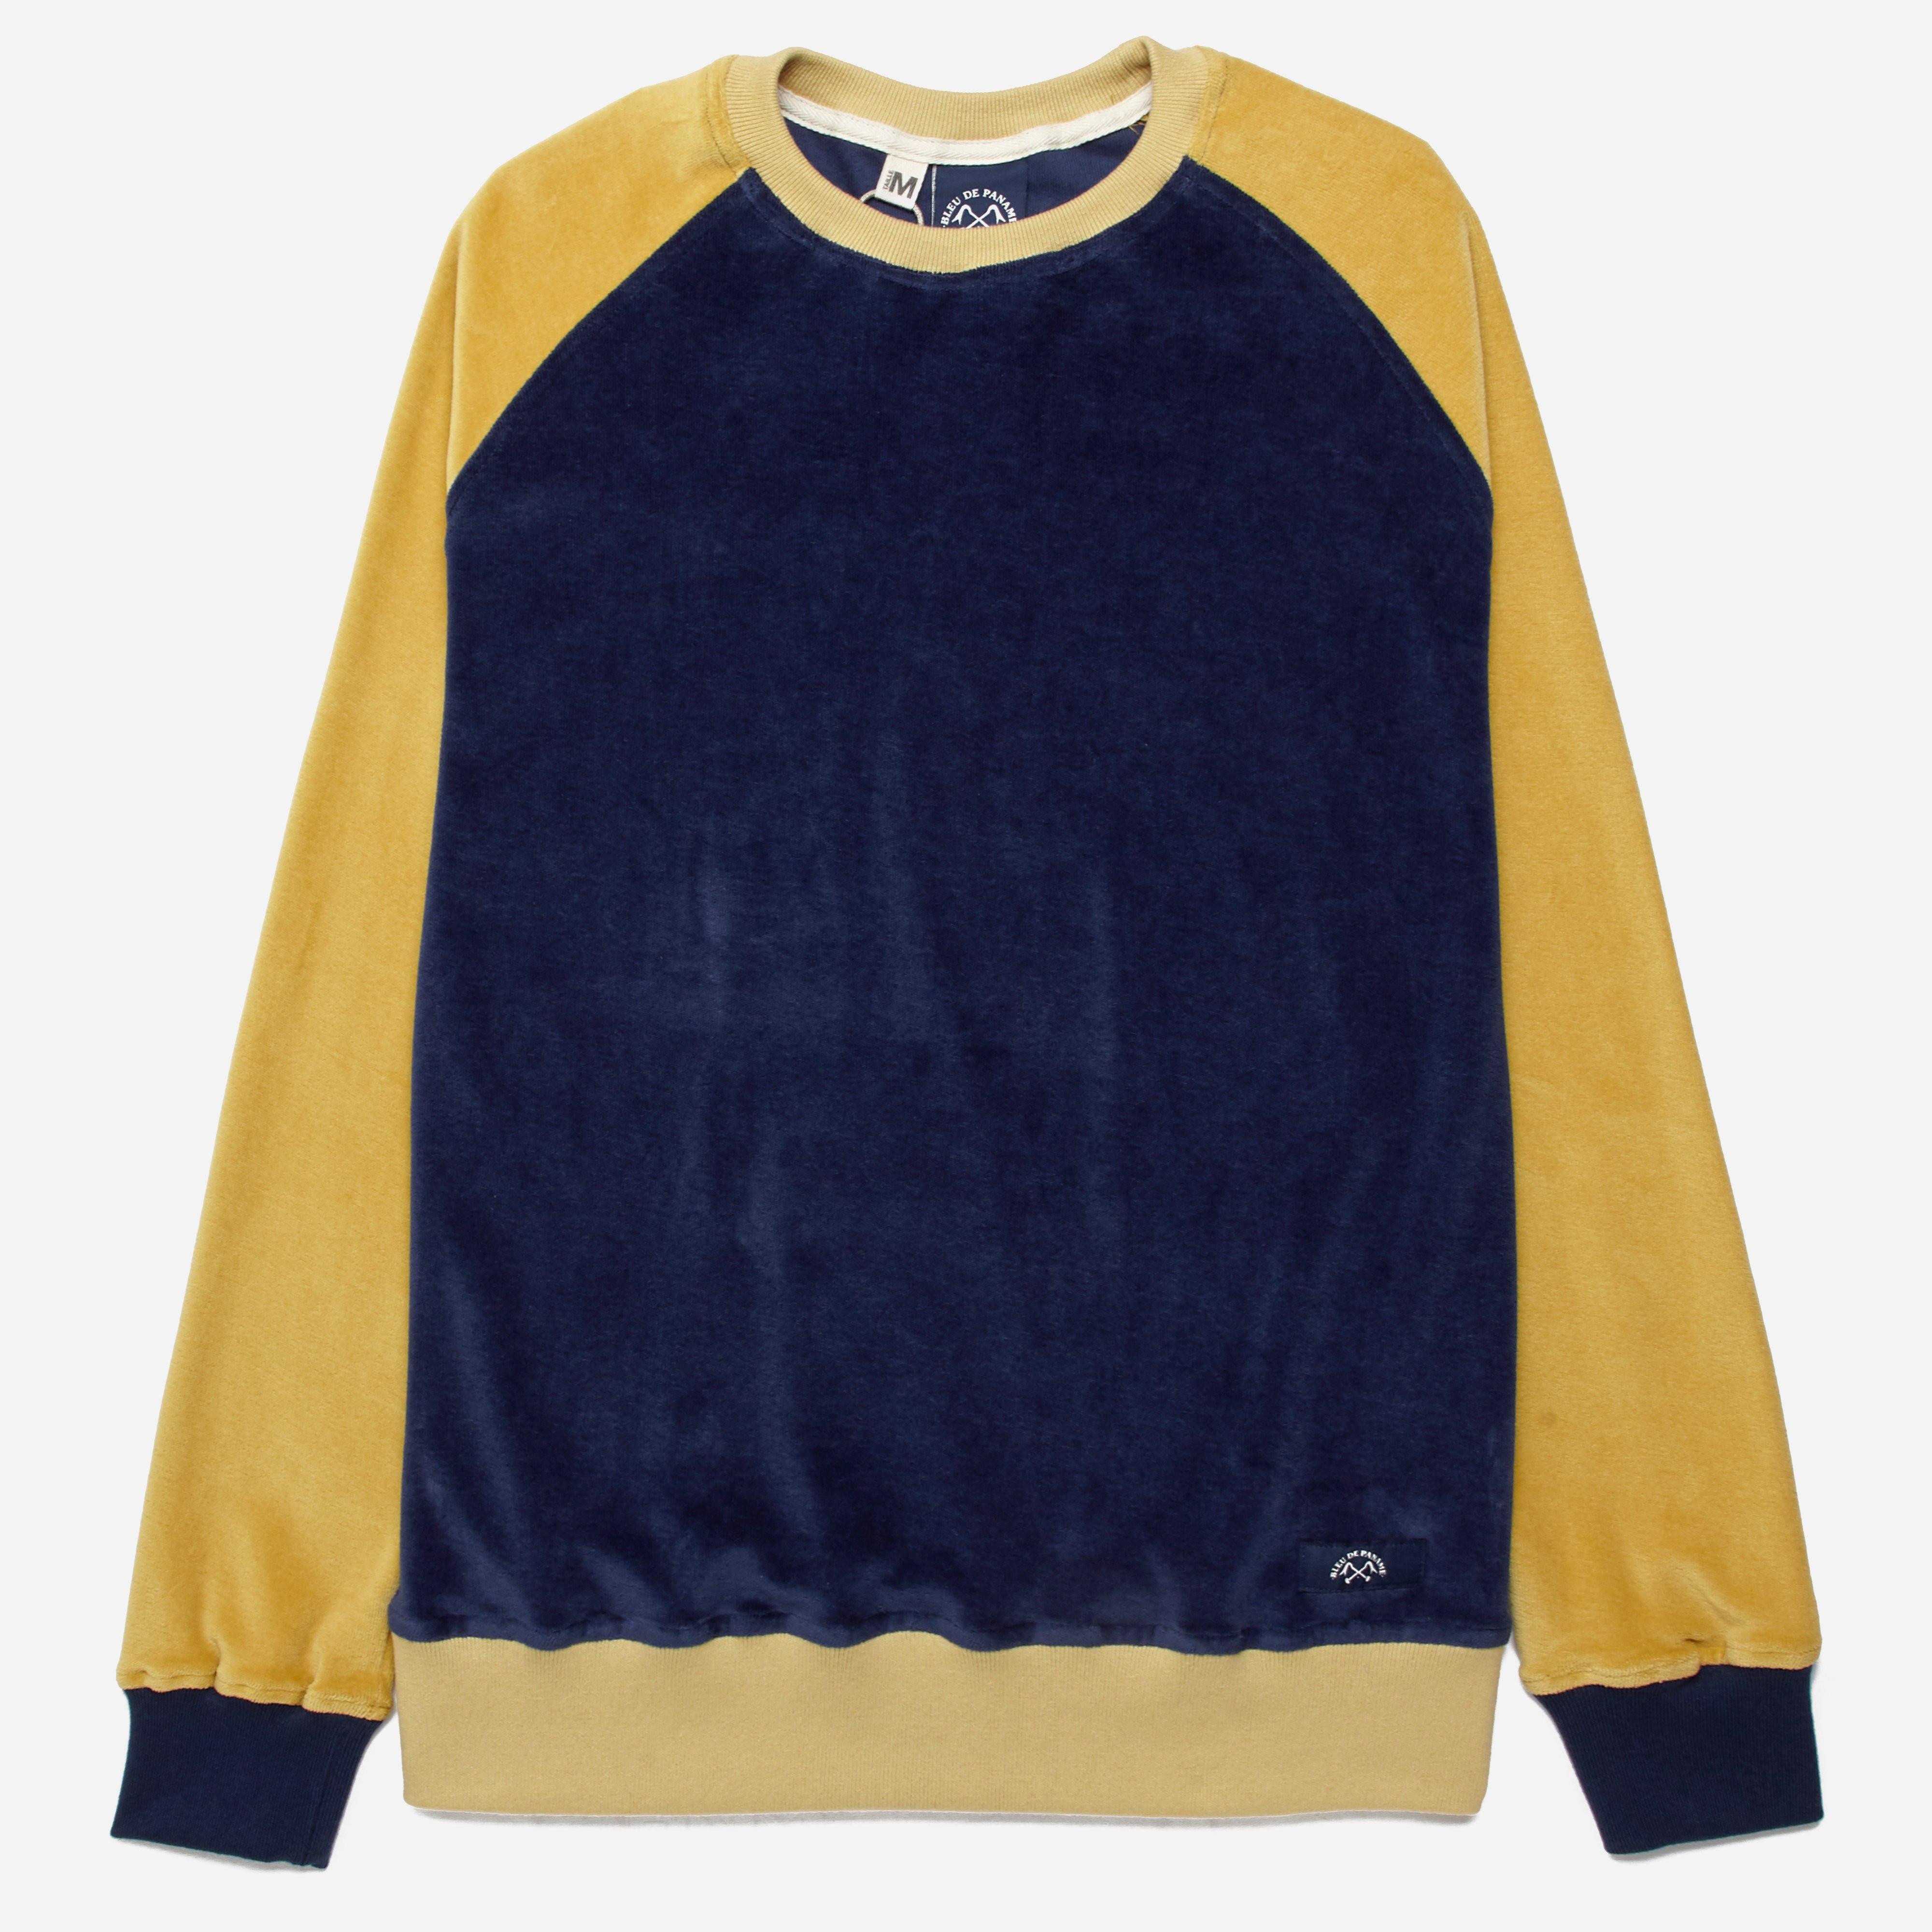 Bleu De Paname Raglan Sweatshirt